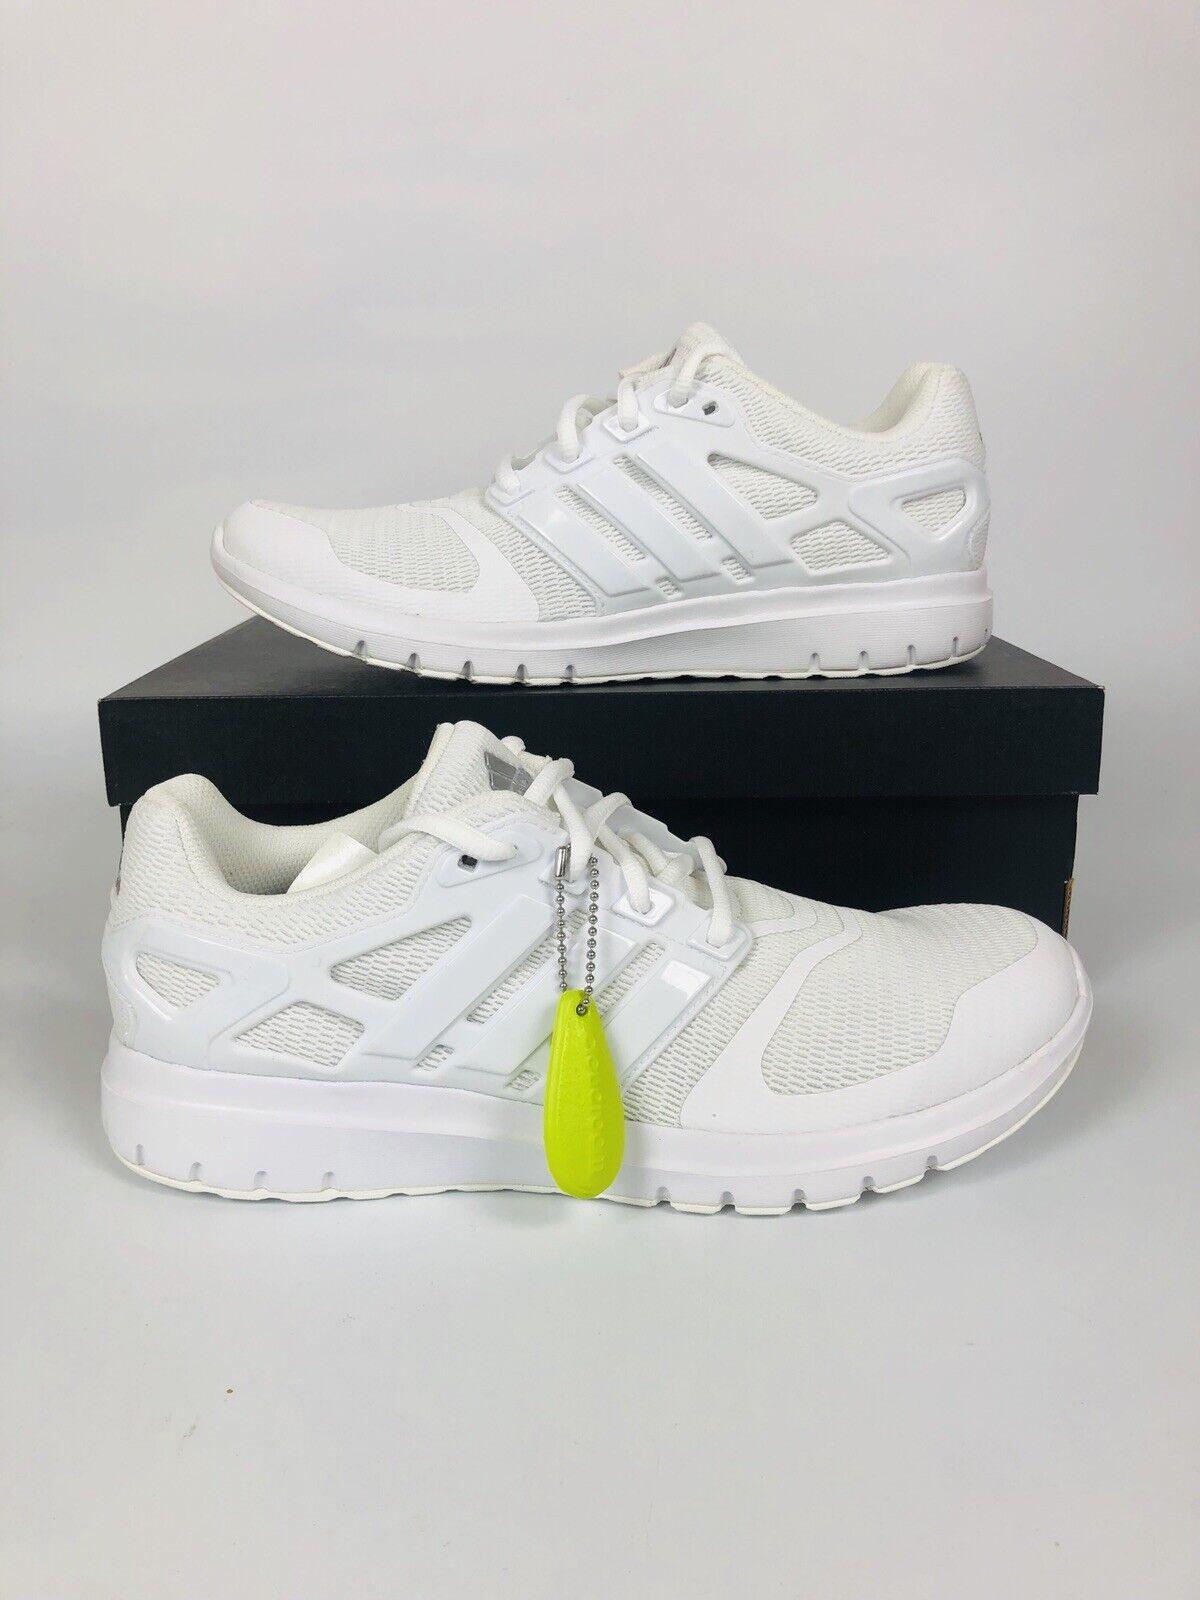 de acuerdo a Posada habla  adidas Energy Cloud V White Running Cross Training Womens Athletic Shoes  Size 8 for sale online | eBay